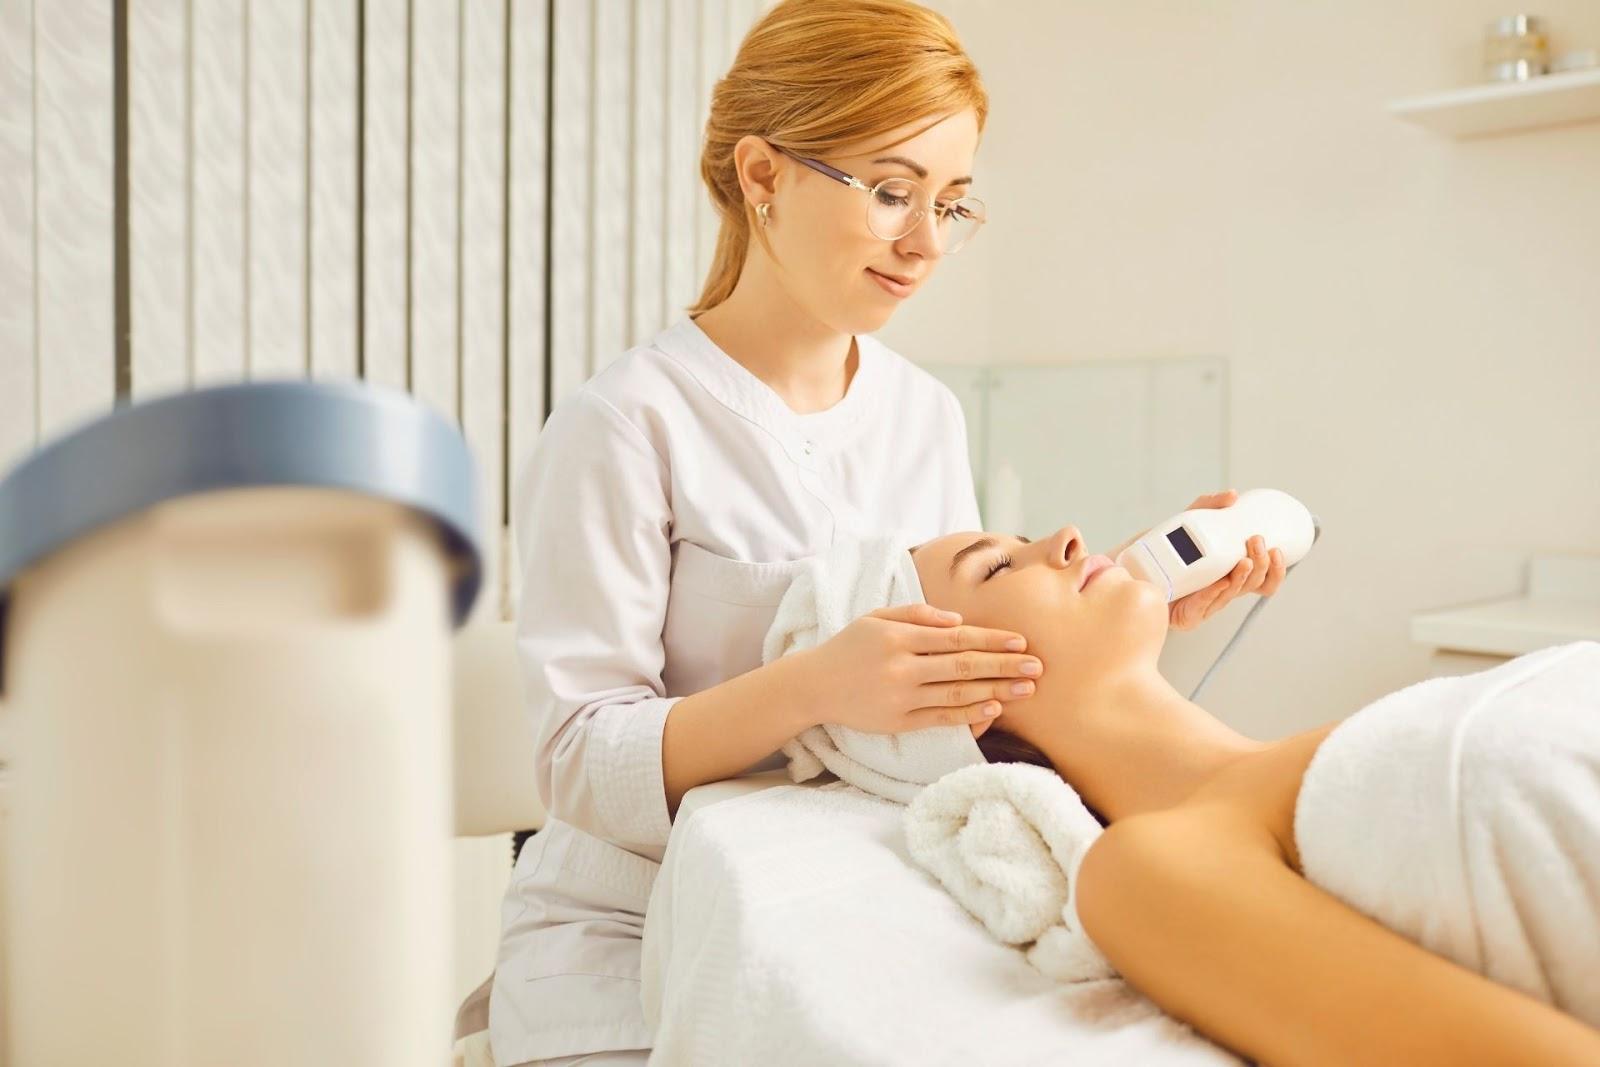 A woman receiving a minimally invasive procedure